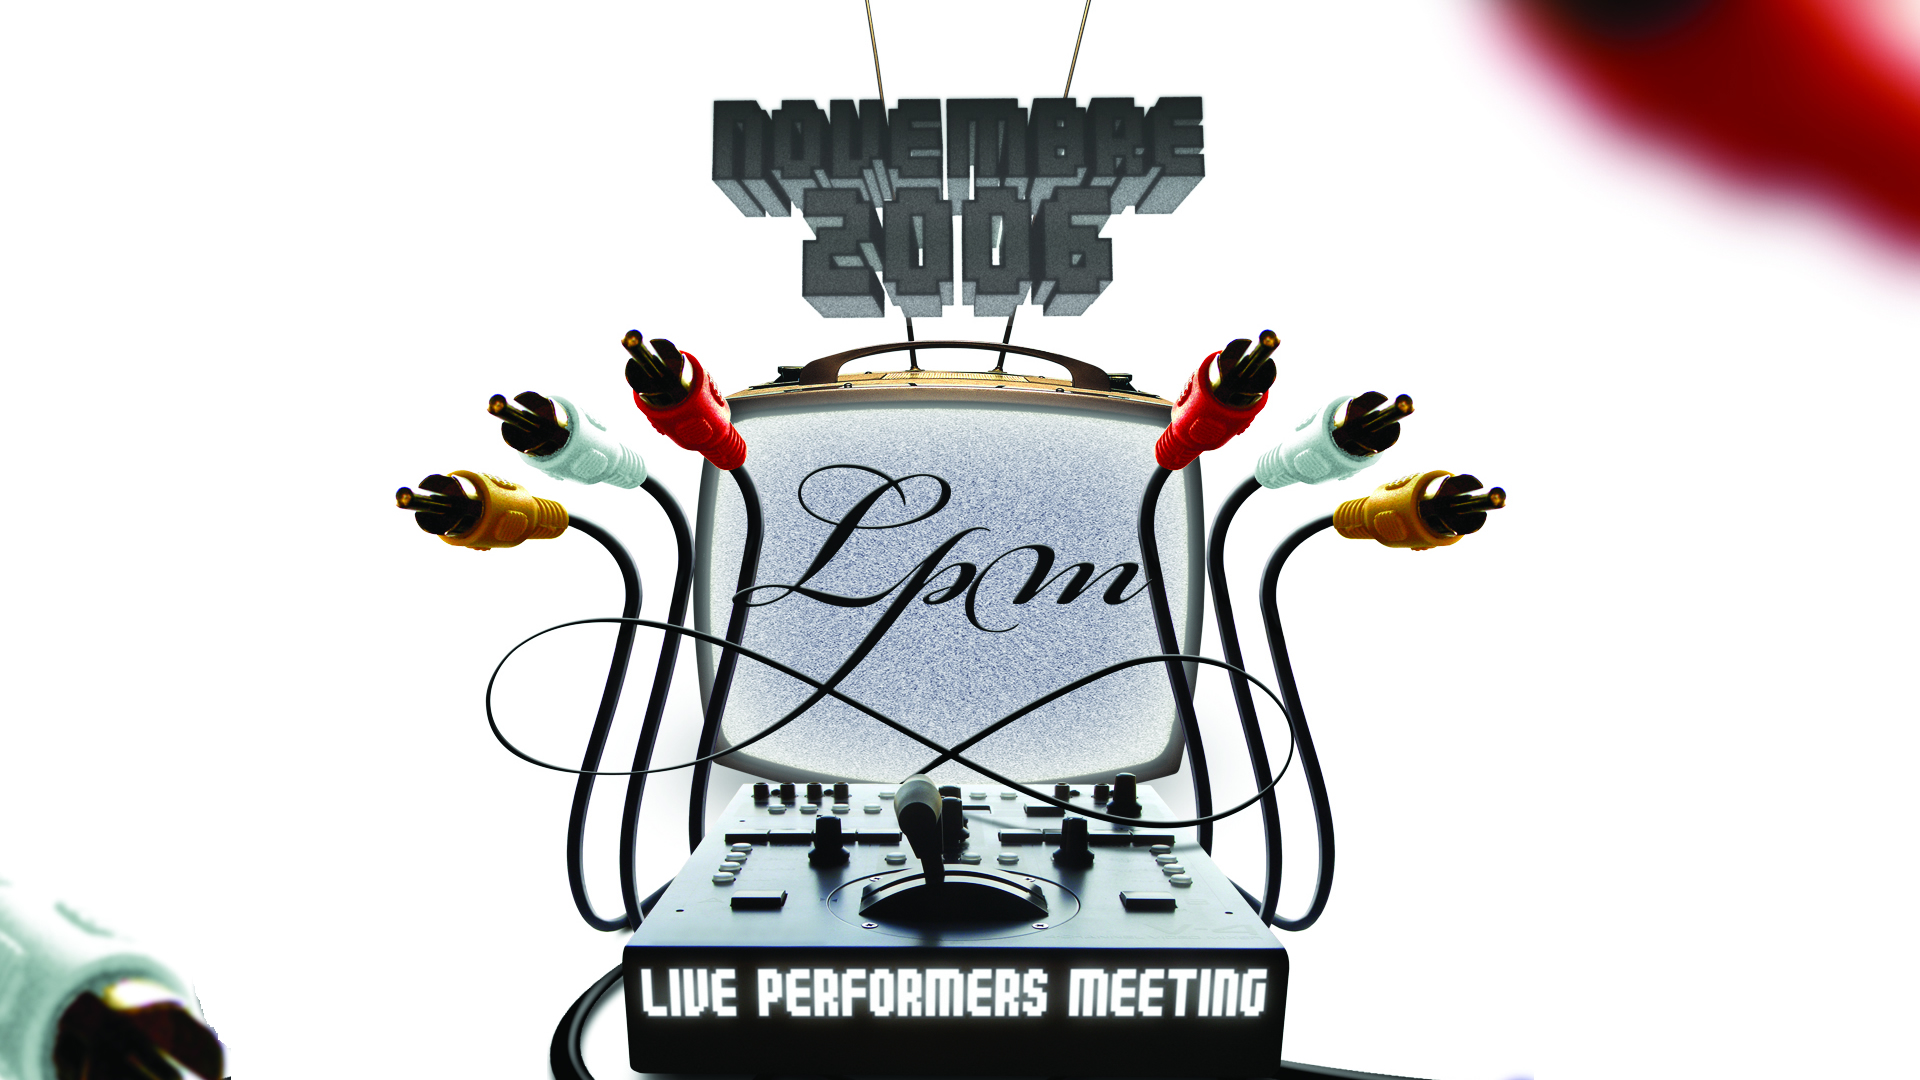 LPM 2006 Rome